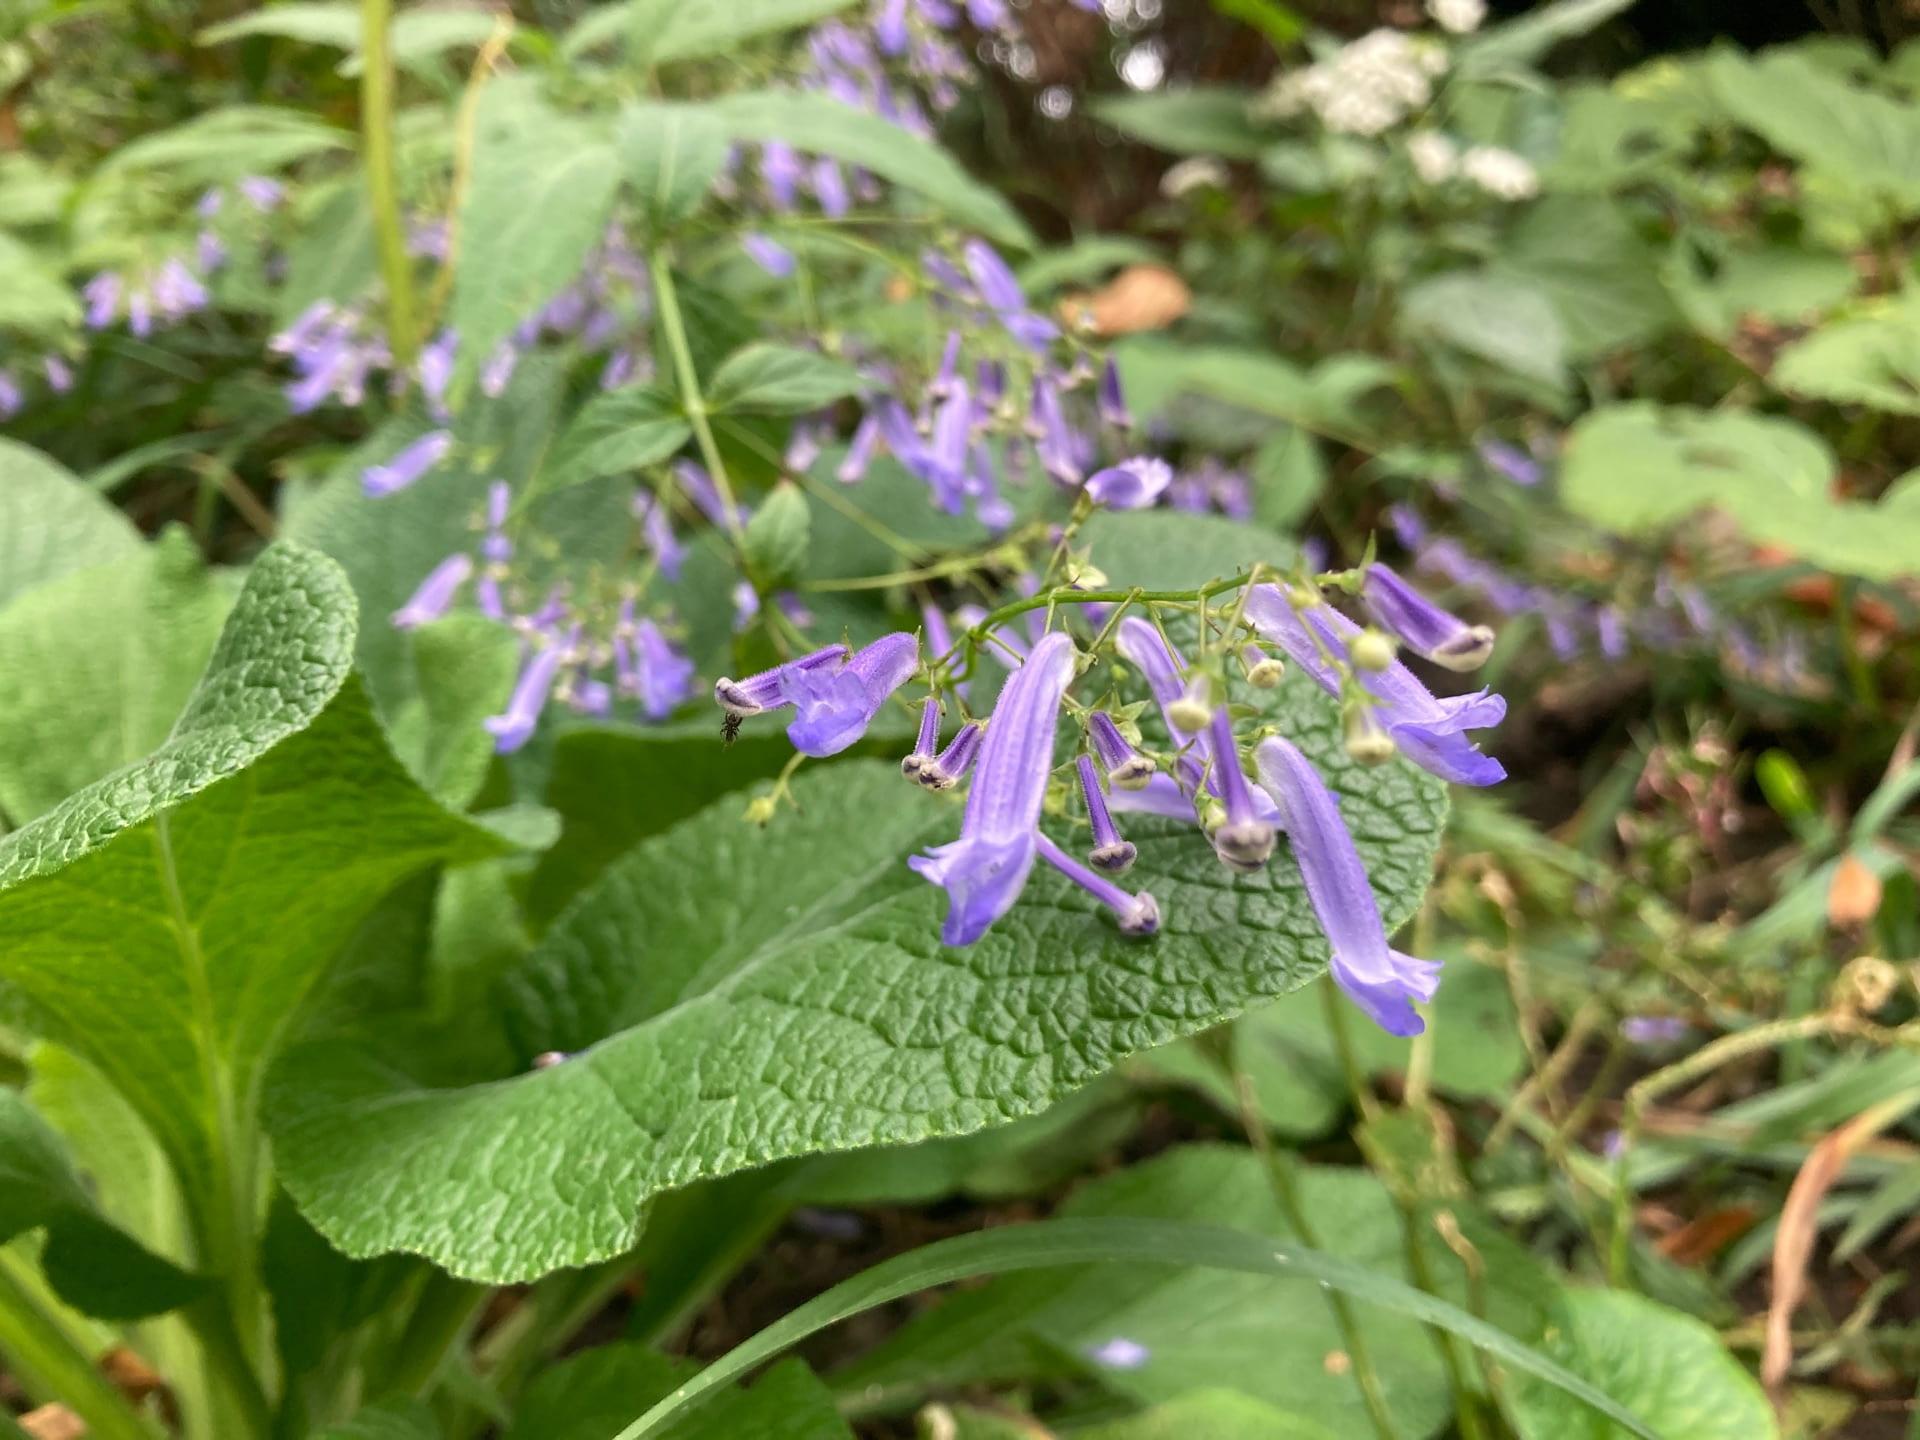 Blue drop-like flowers of Rabdosia longituba cascade down the waterfall slope.